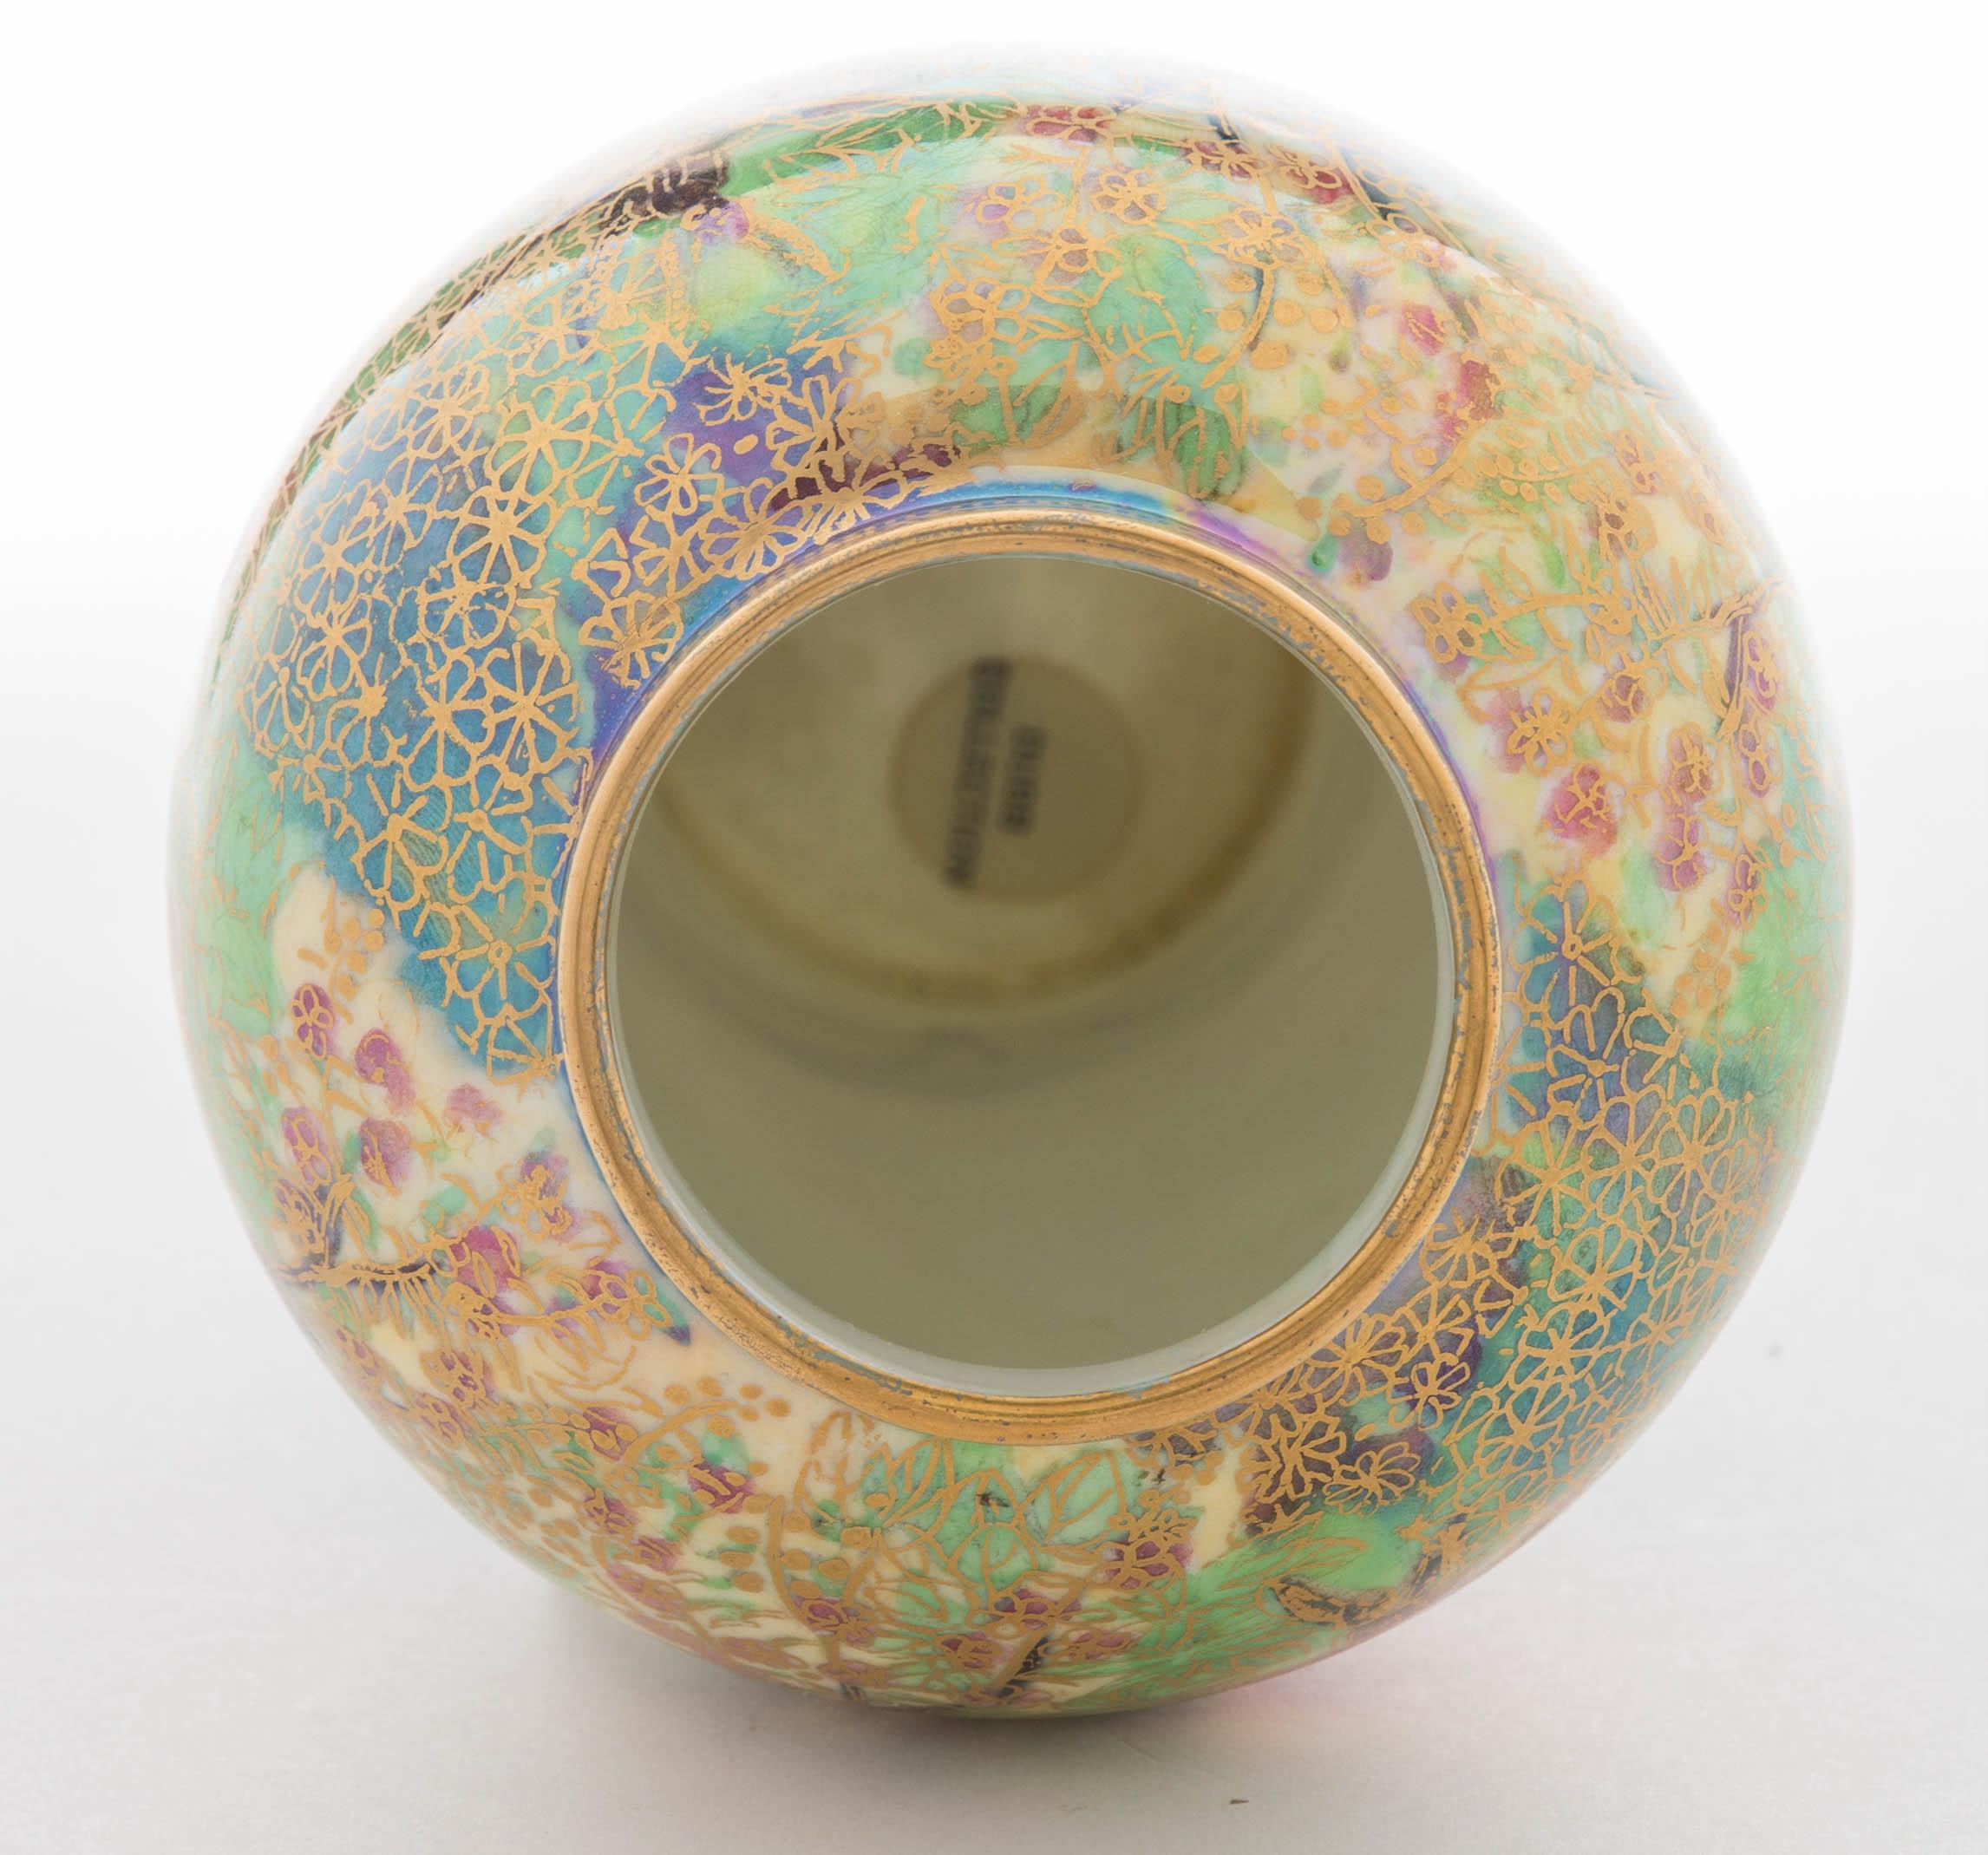 Antique Wedgwood Pottery & Porcelain History & Marks